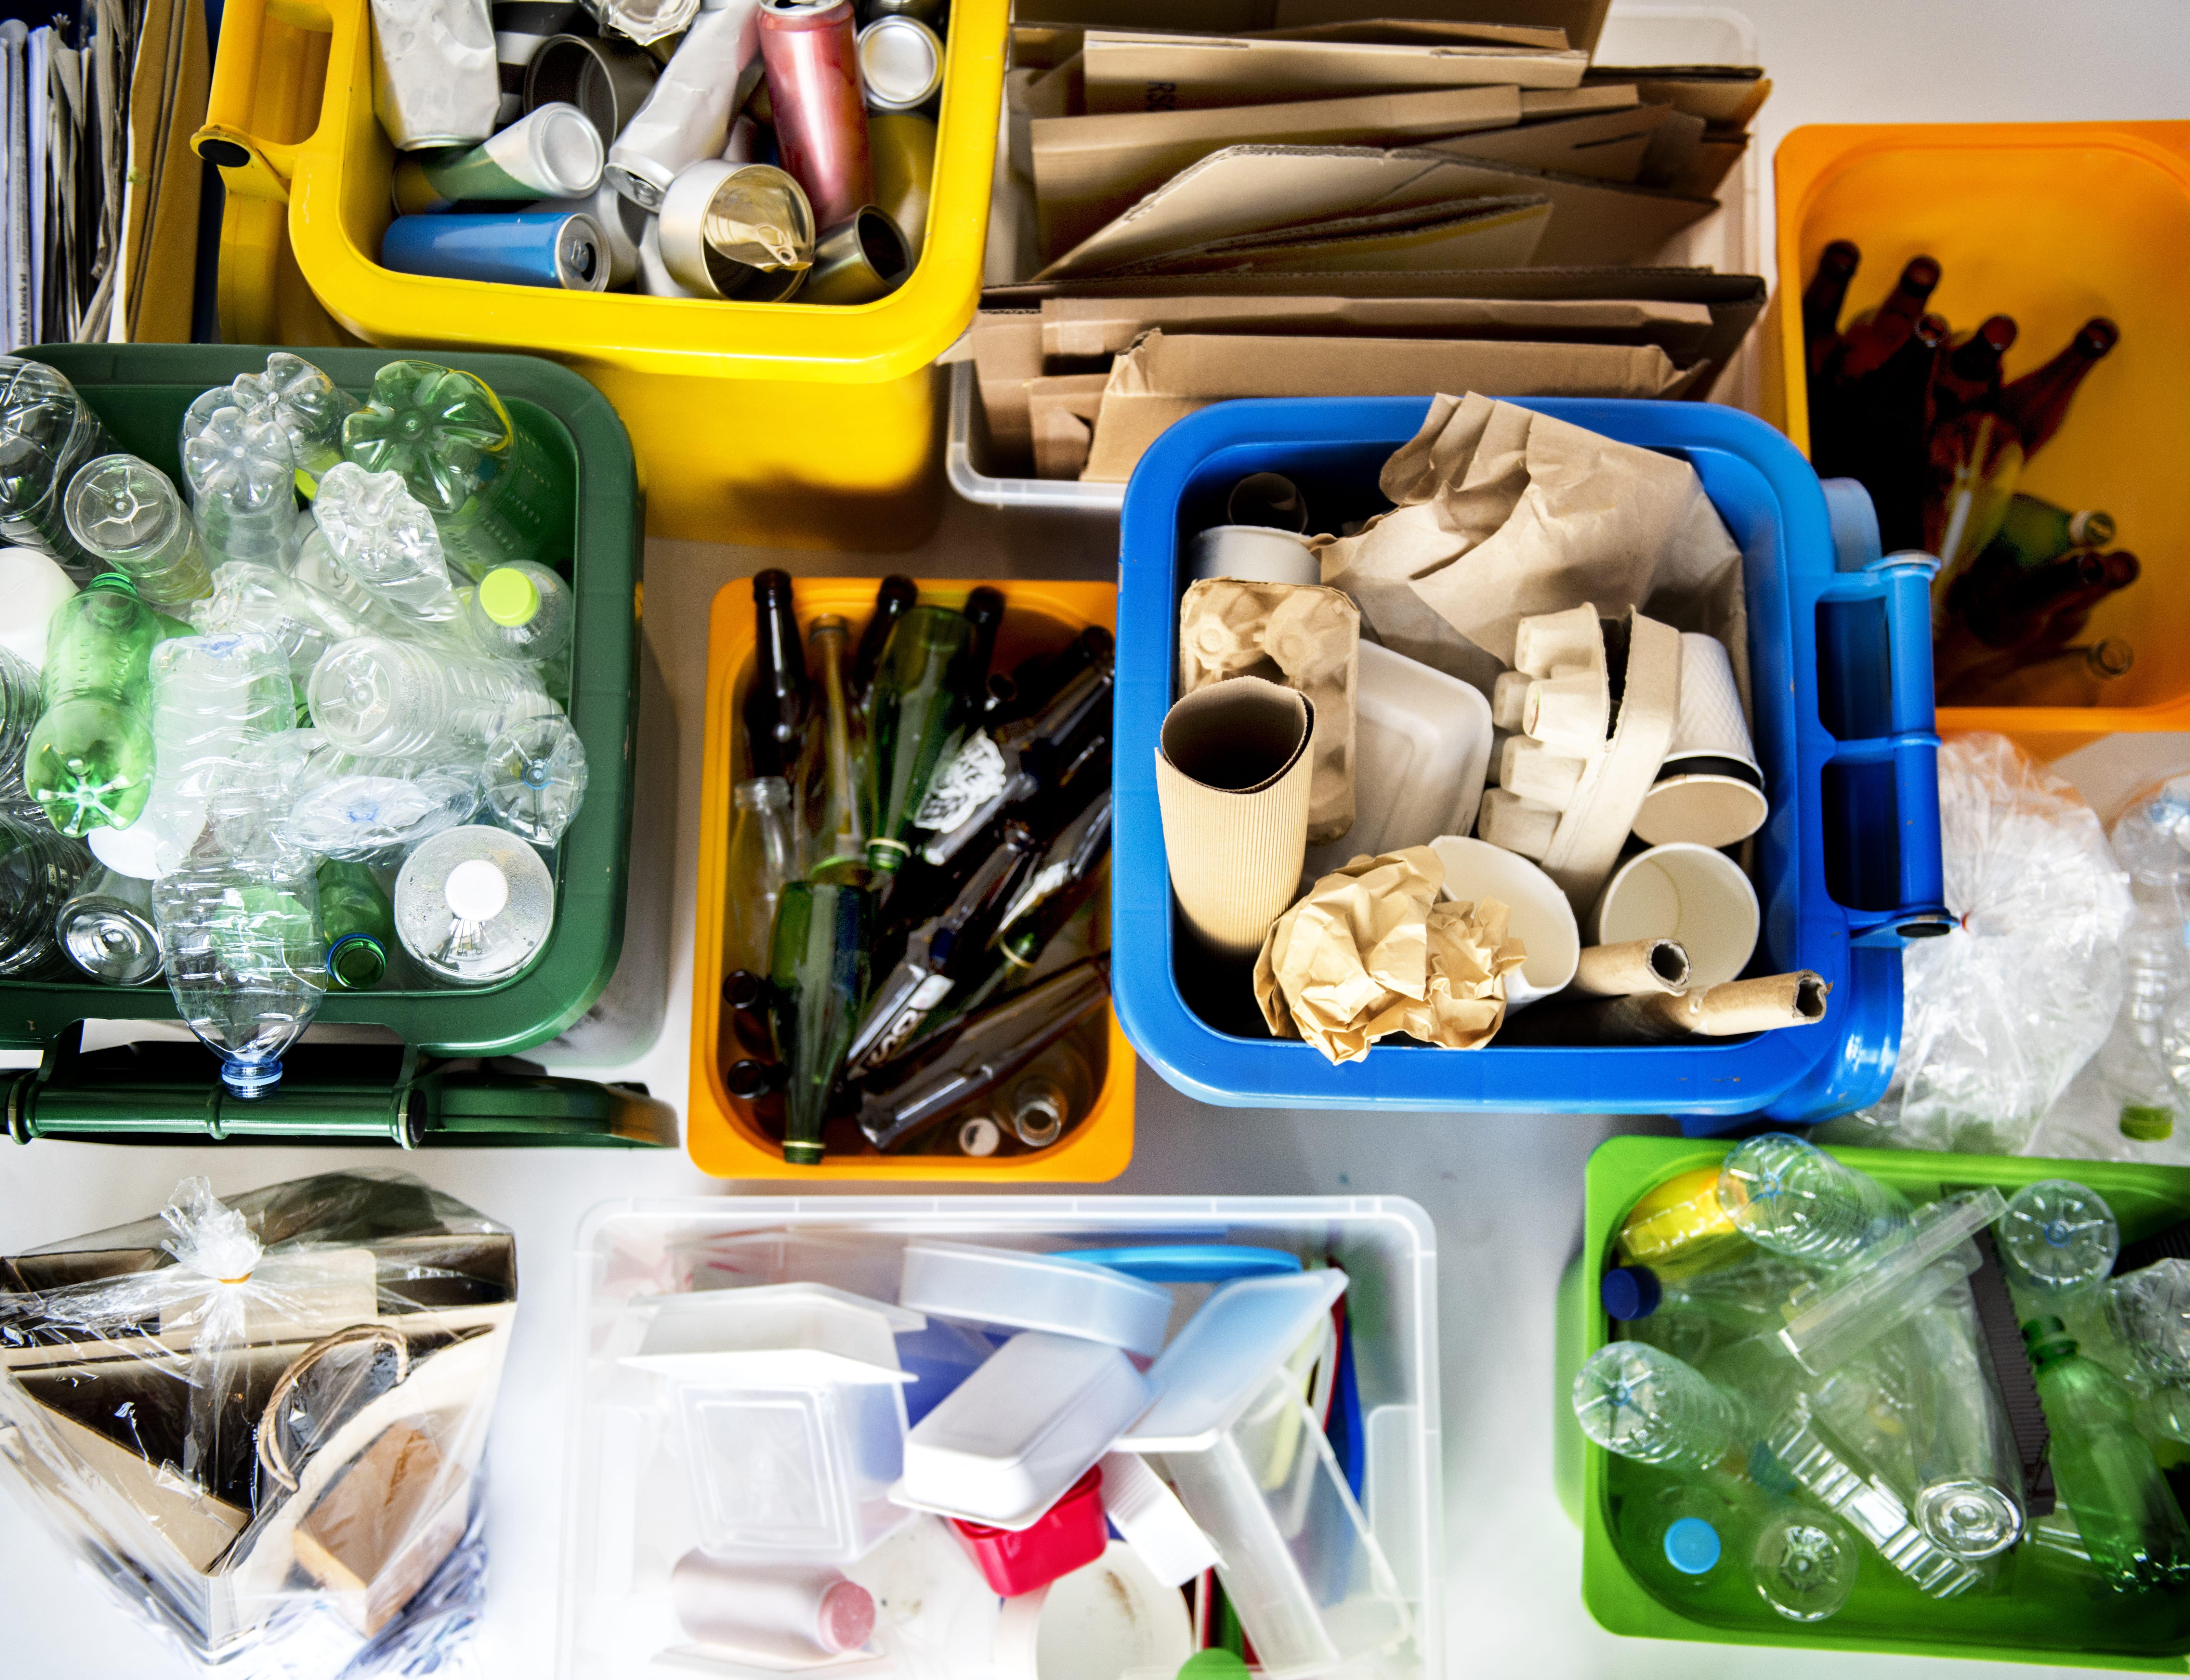 Royston Garbage Service Recycling Comox Valley Regional District